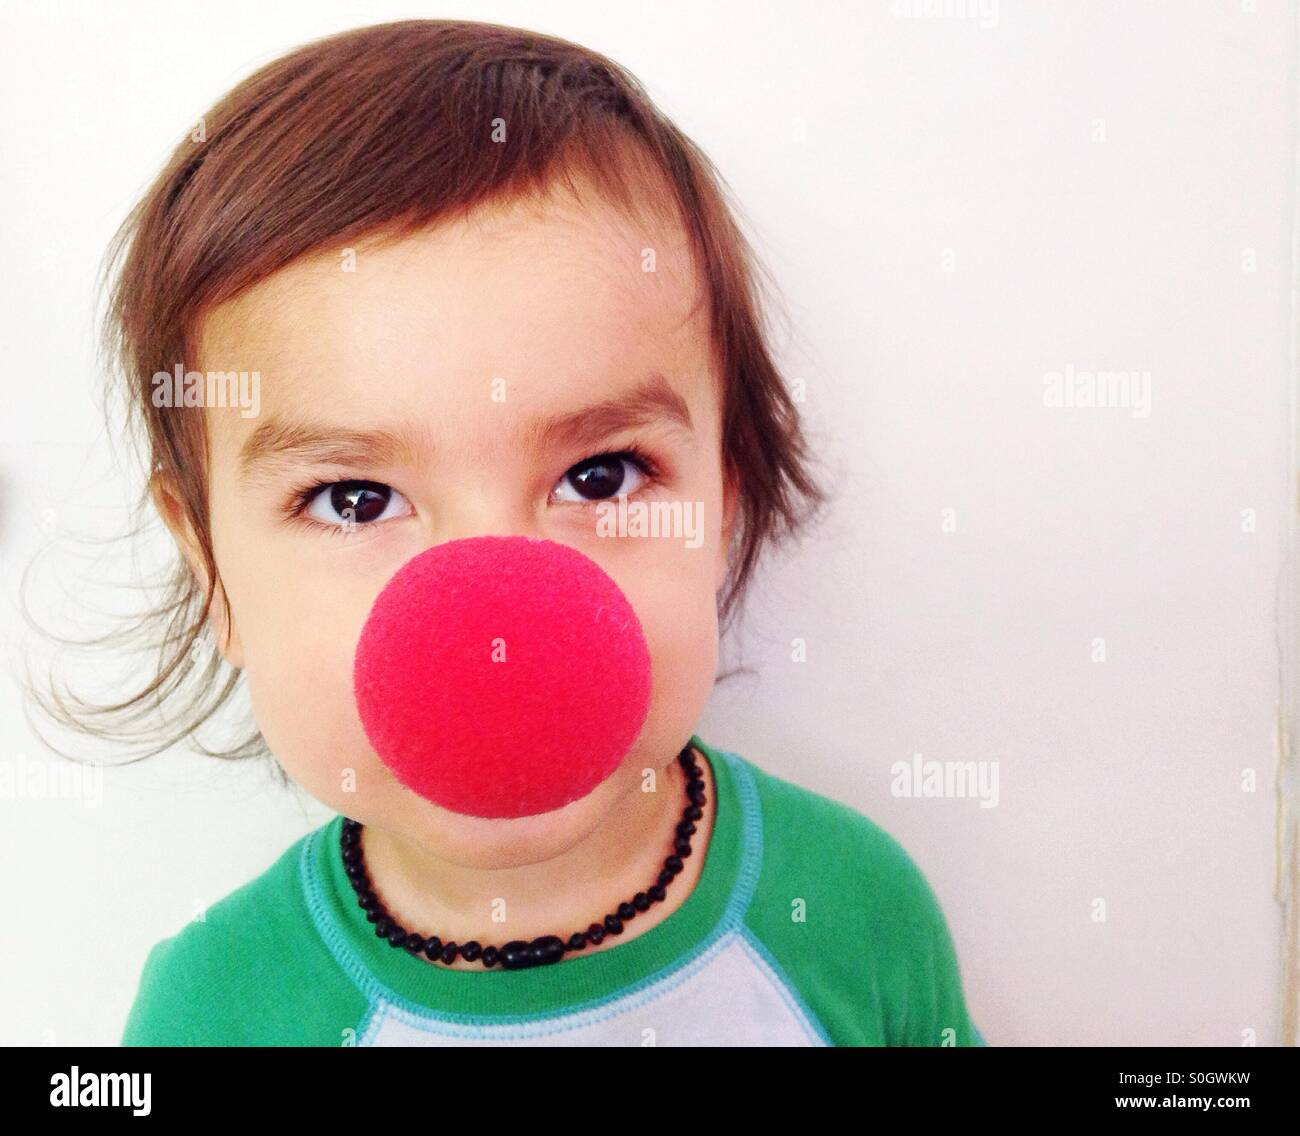 Lindo niño con nariz de payaso roja Imagen De Stock